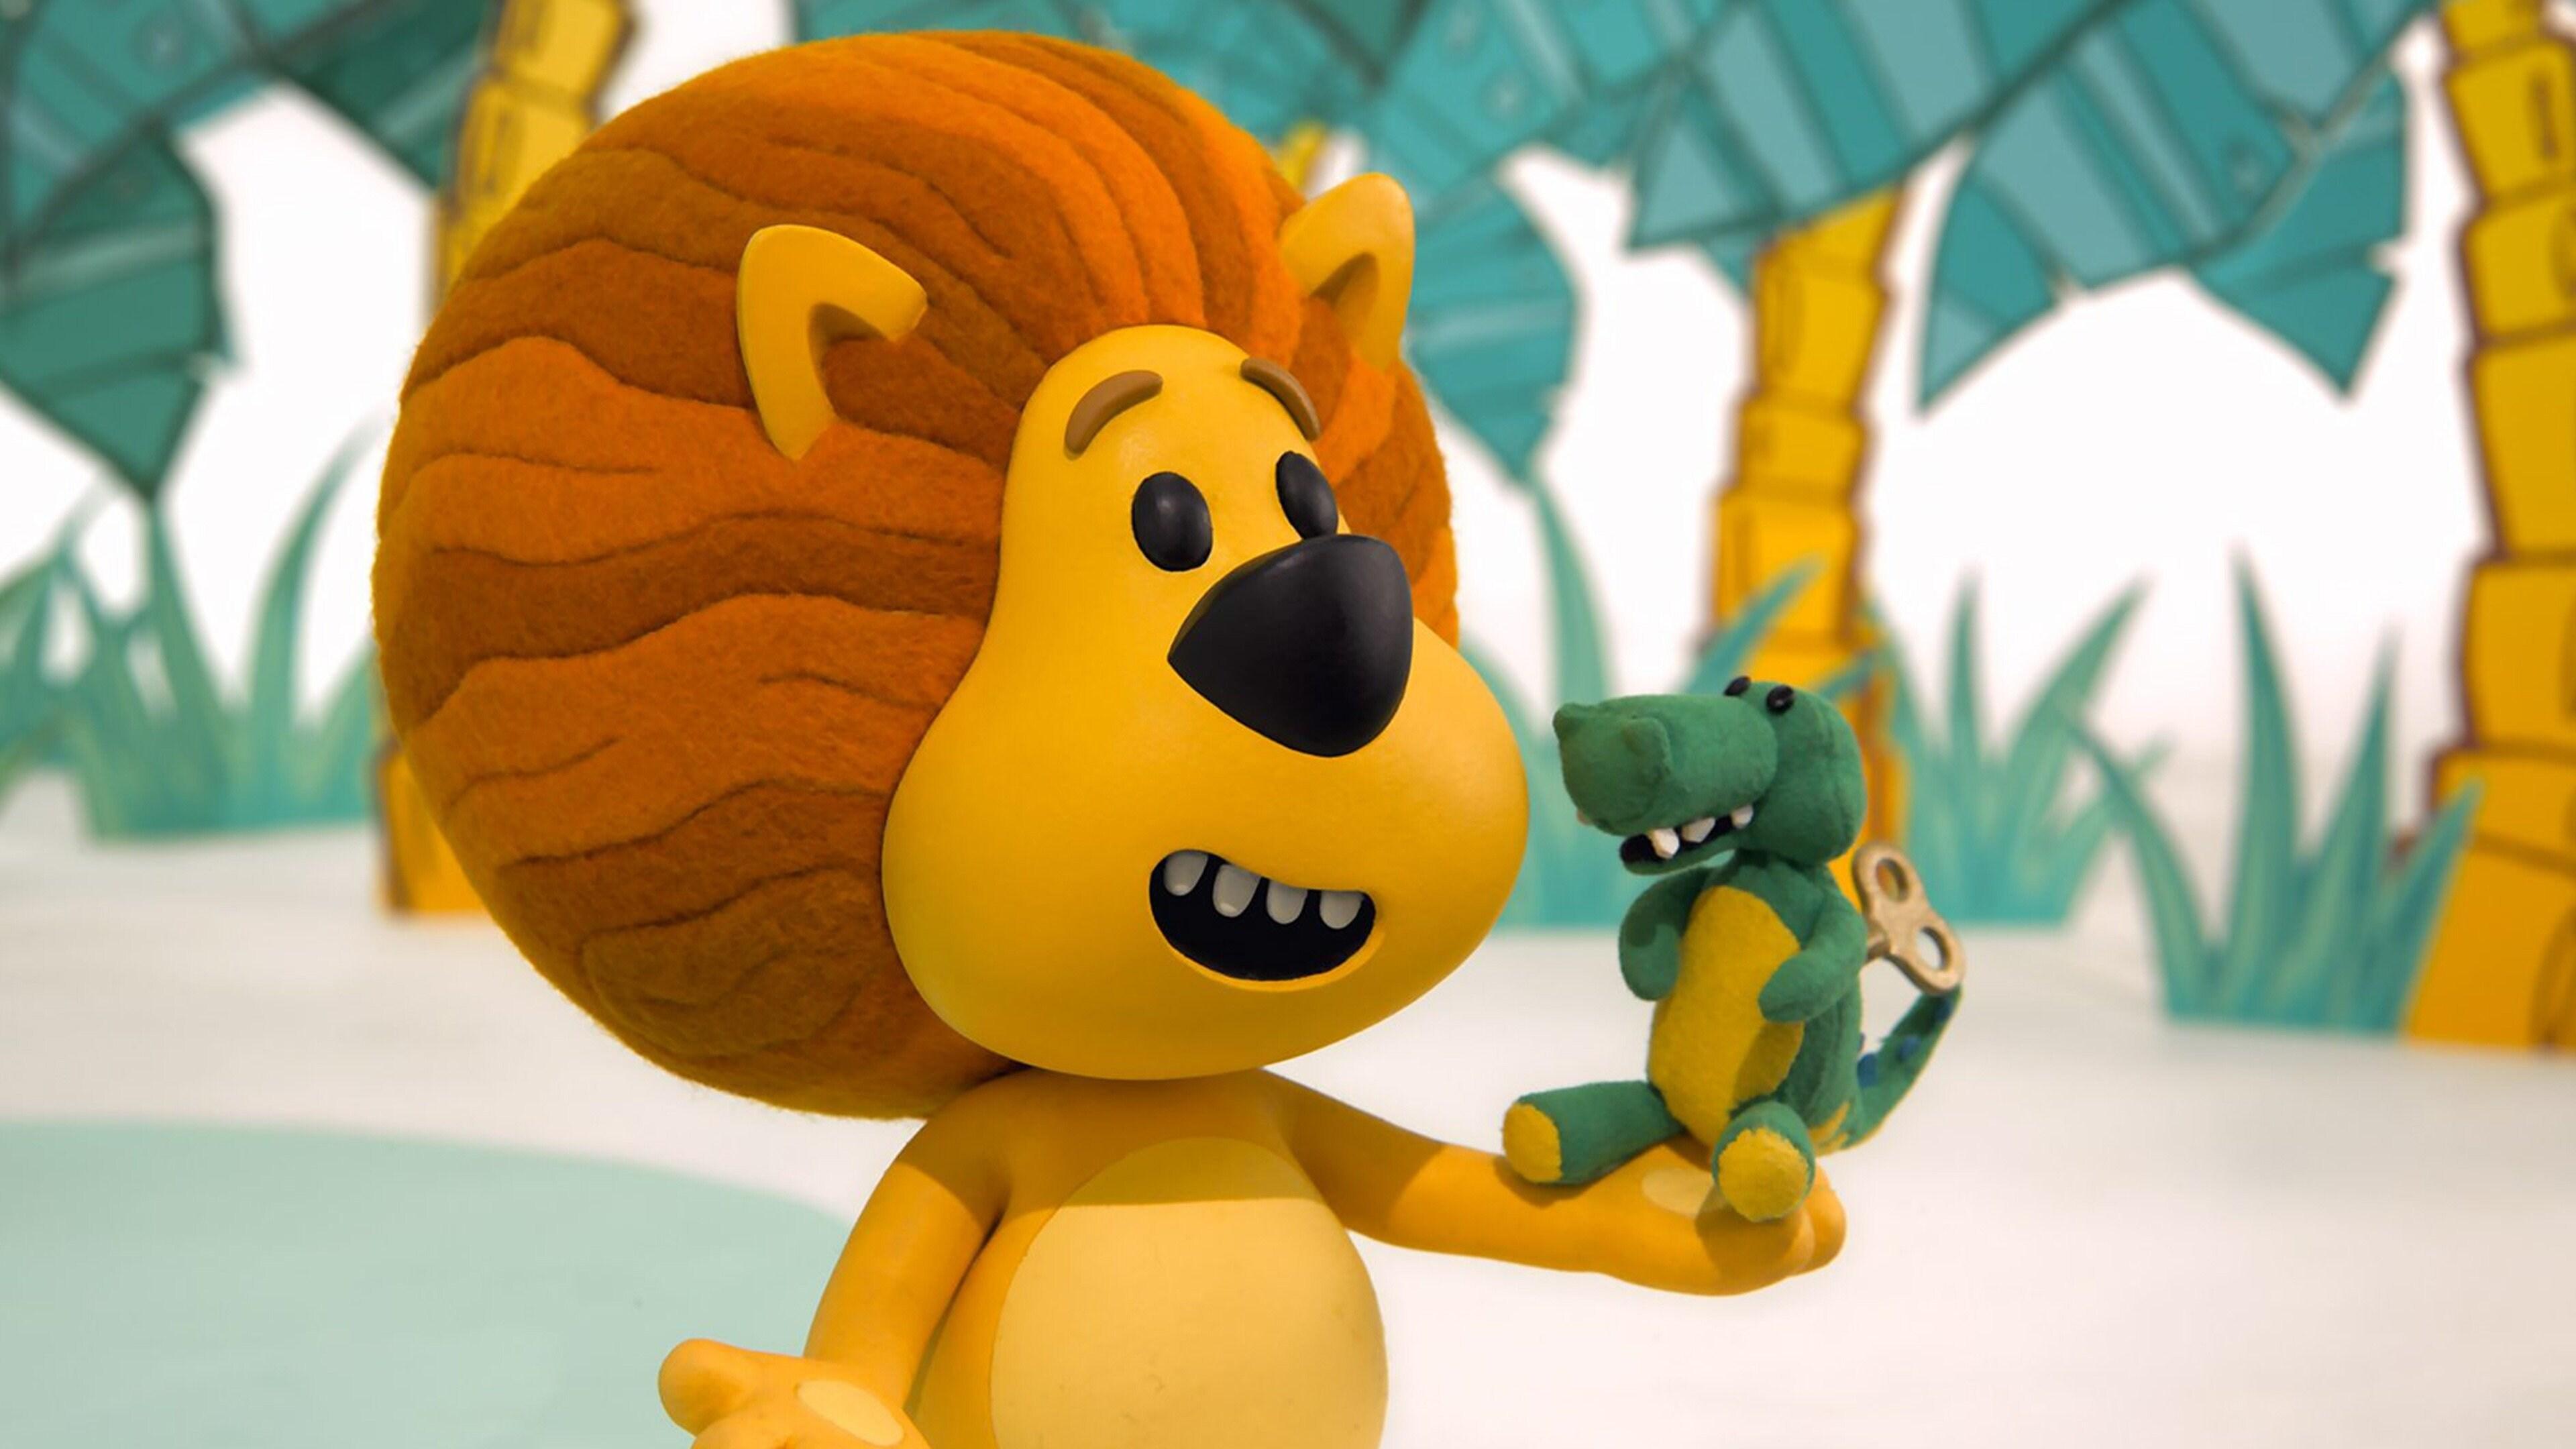 Raa Raa and Crocky's Lost Toy